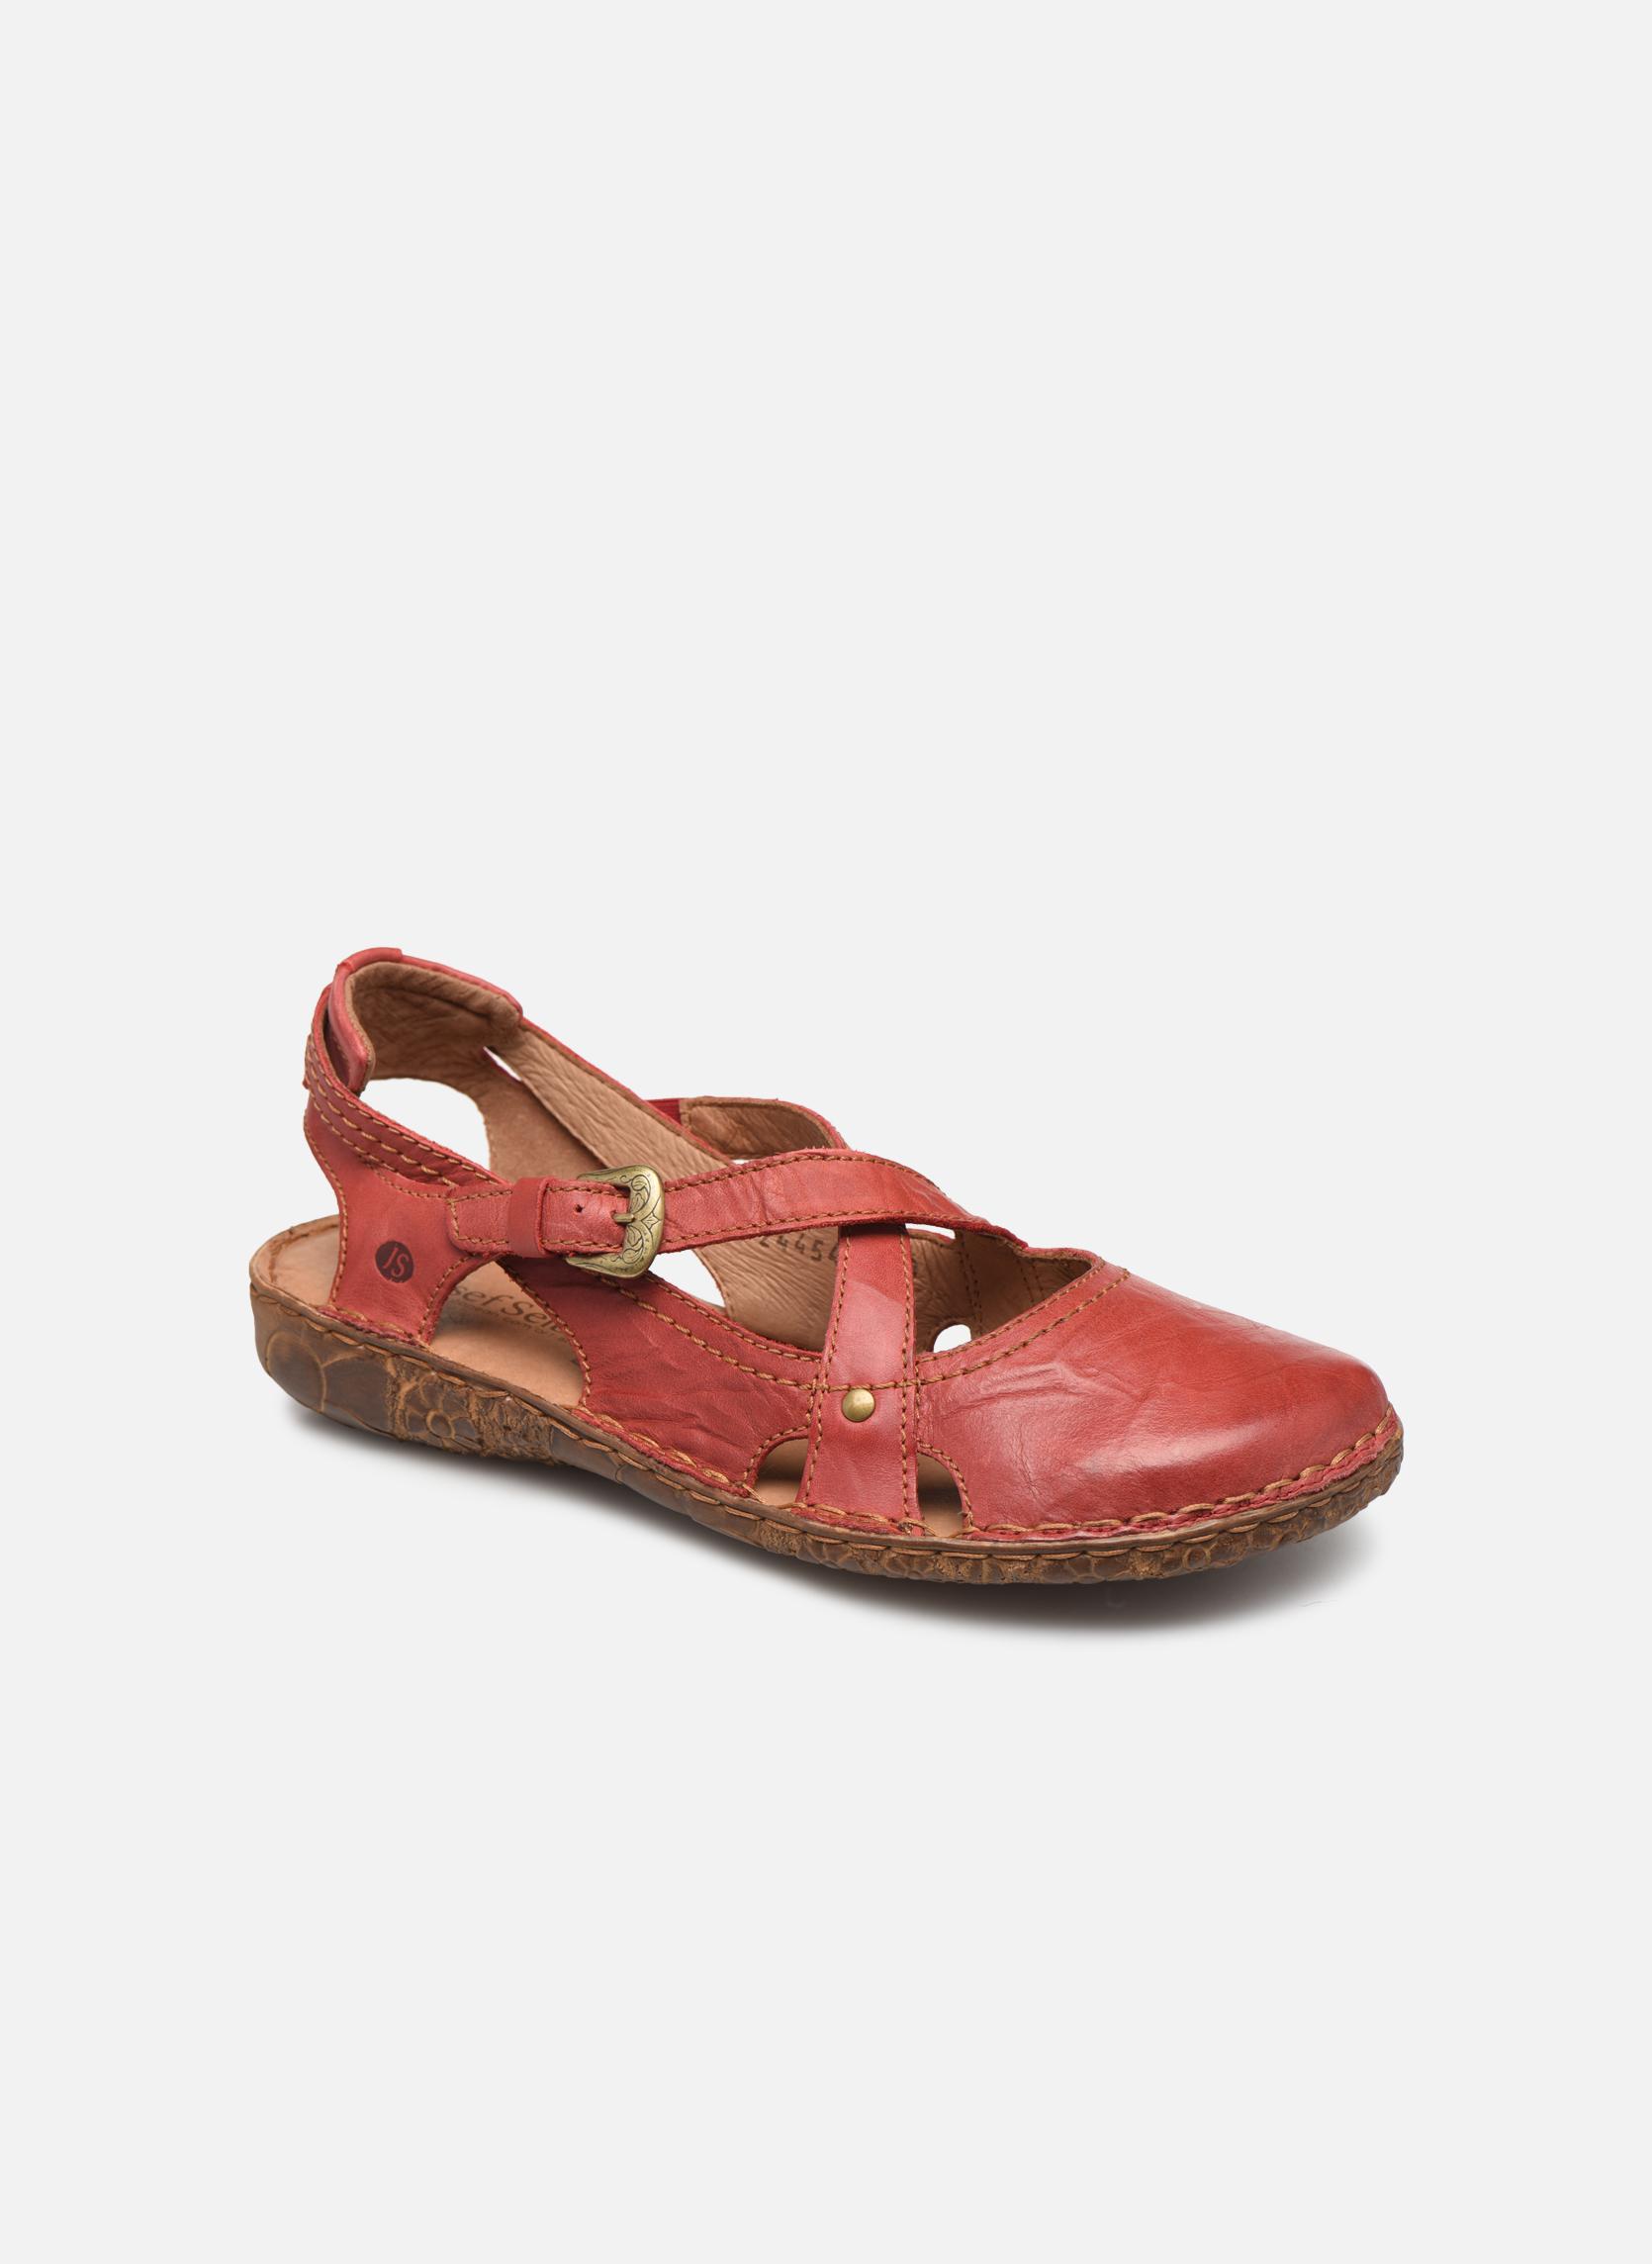 Sandalen Damen Rosalie 13